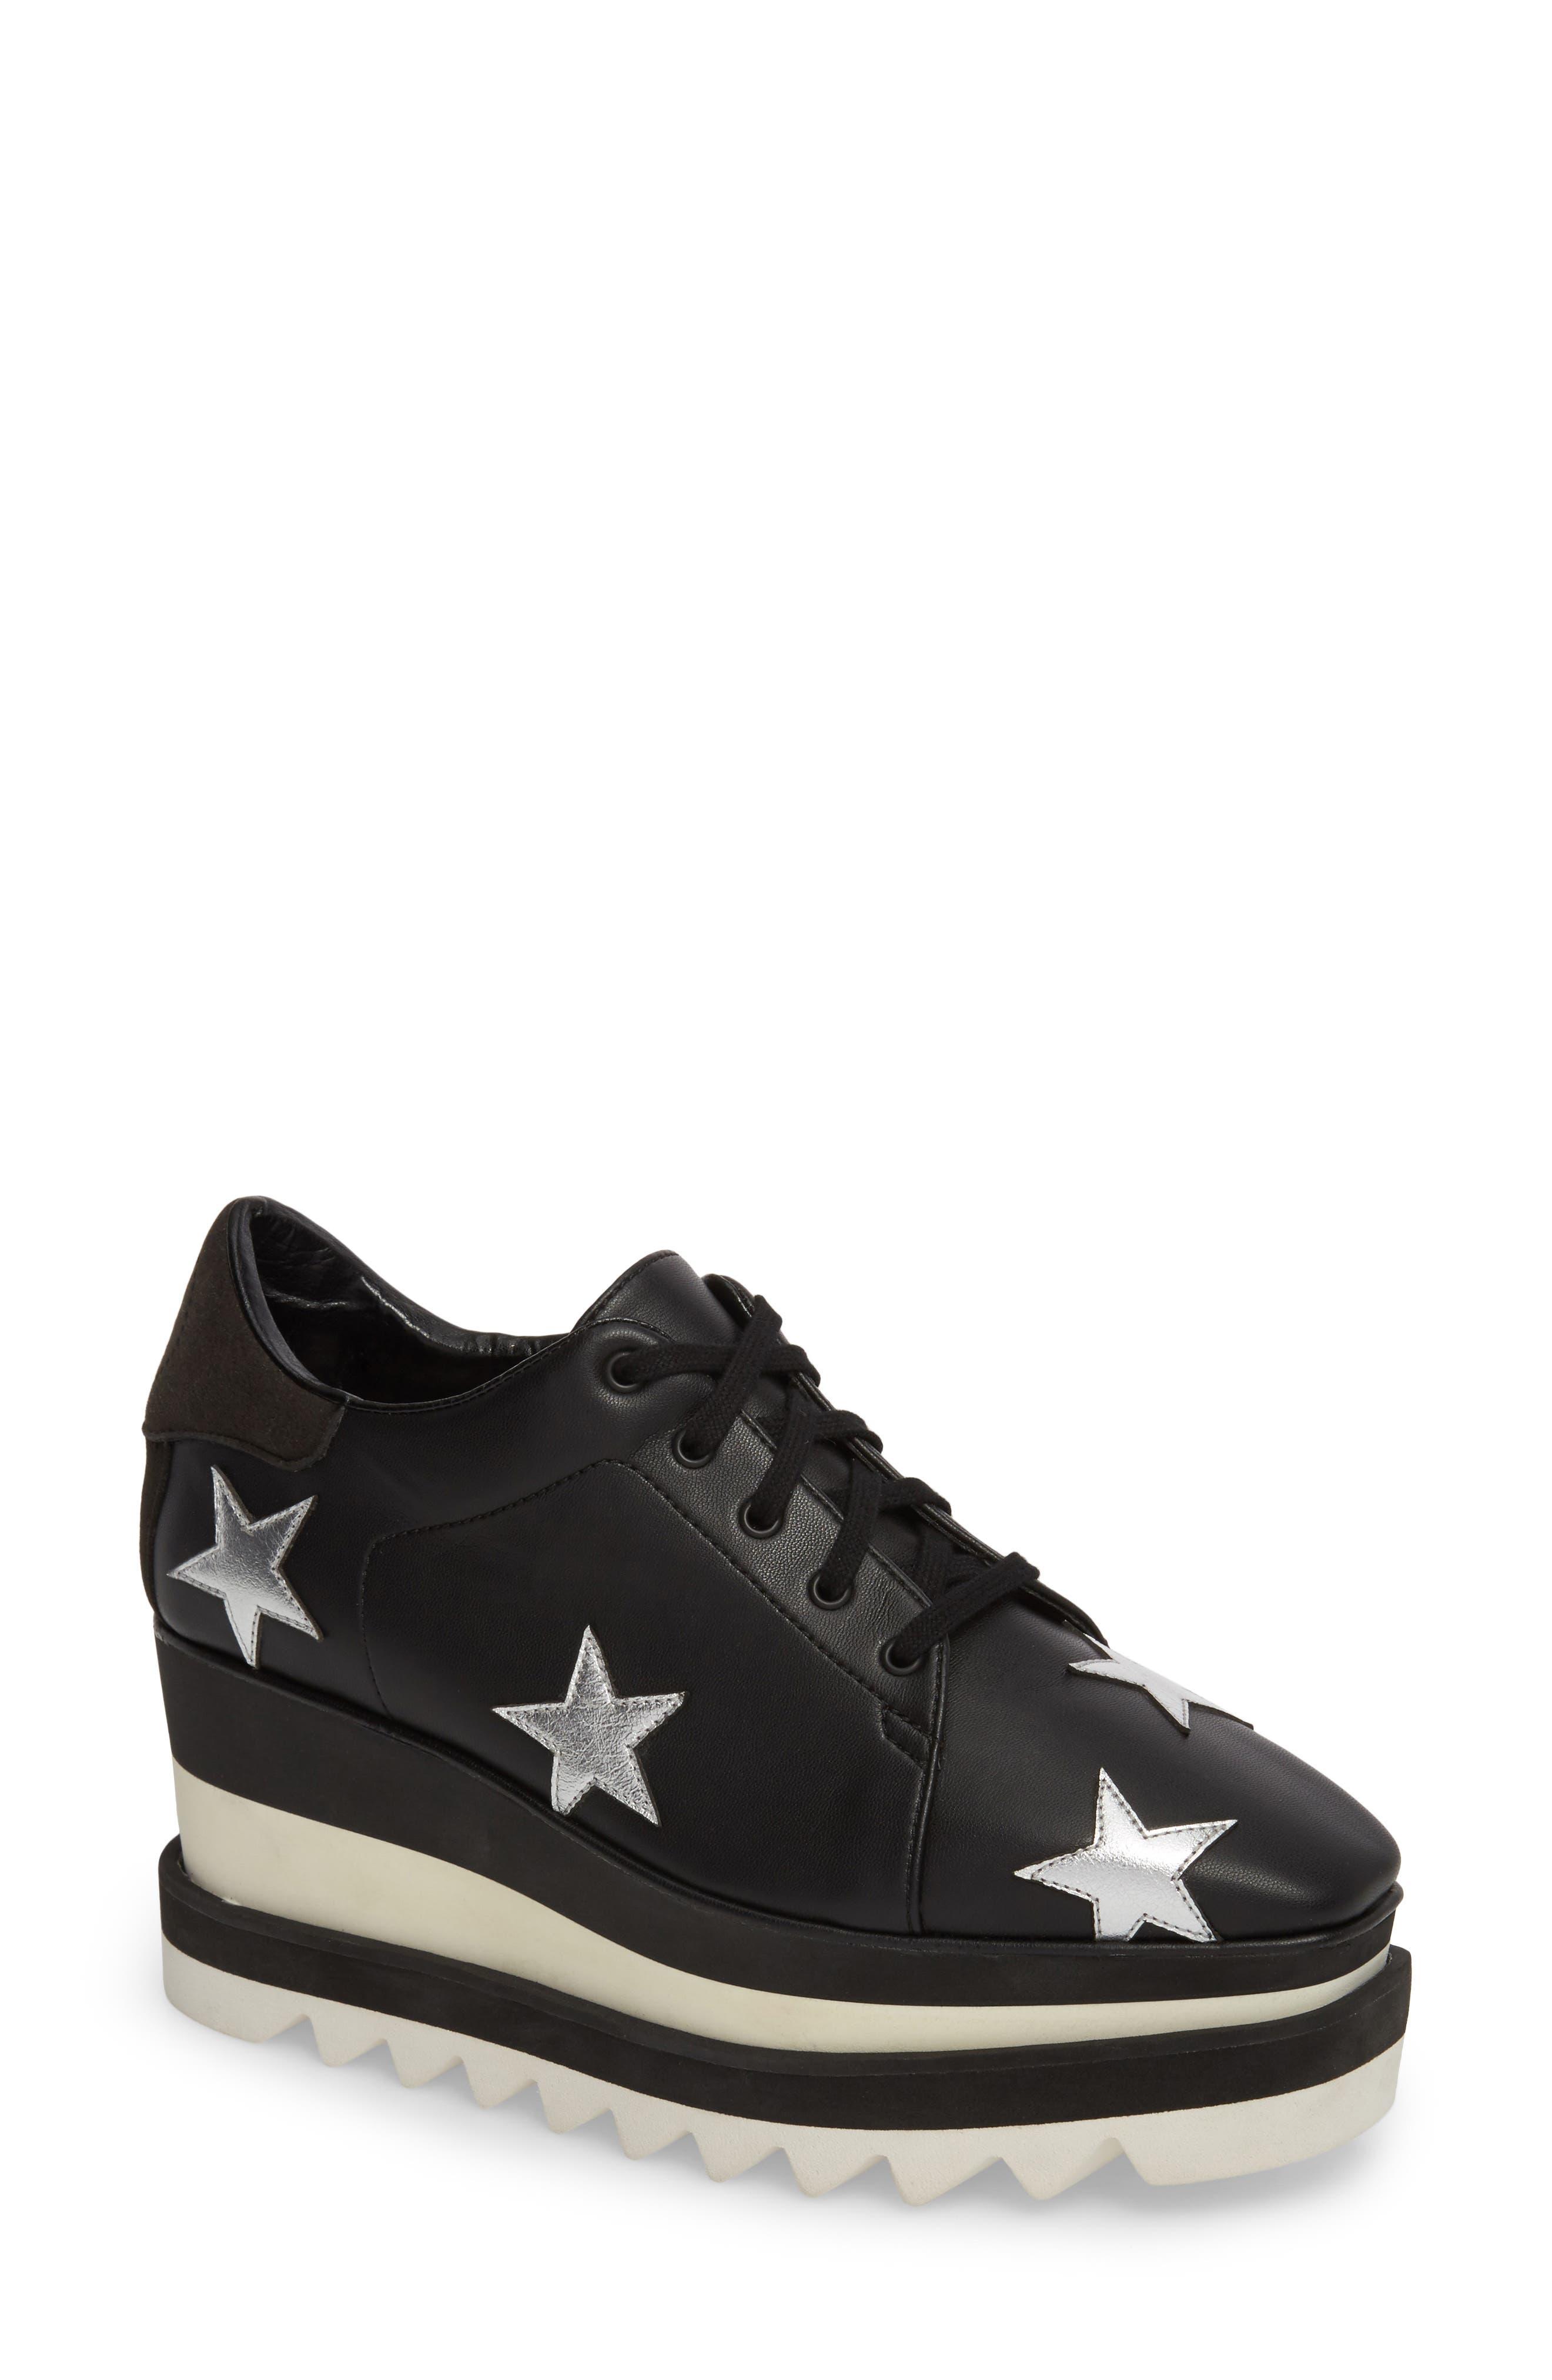 Elyse Platform Sneaker,                             Main thumbnail 1, color,                             BLACK